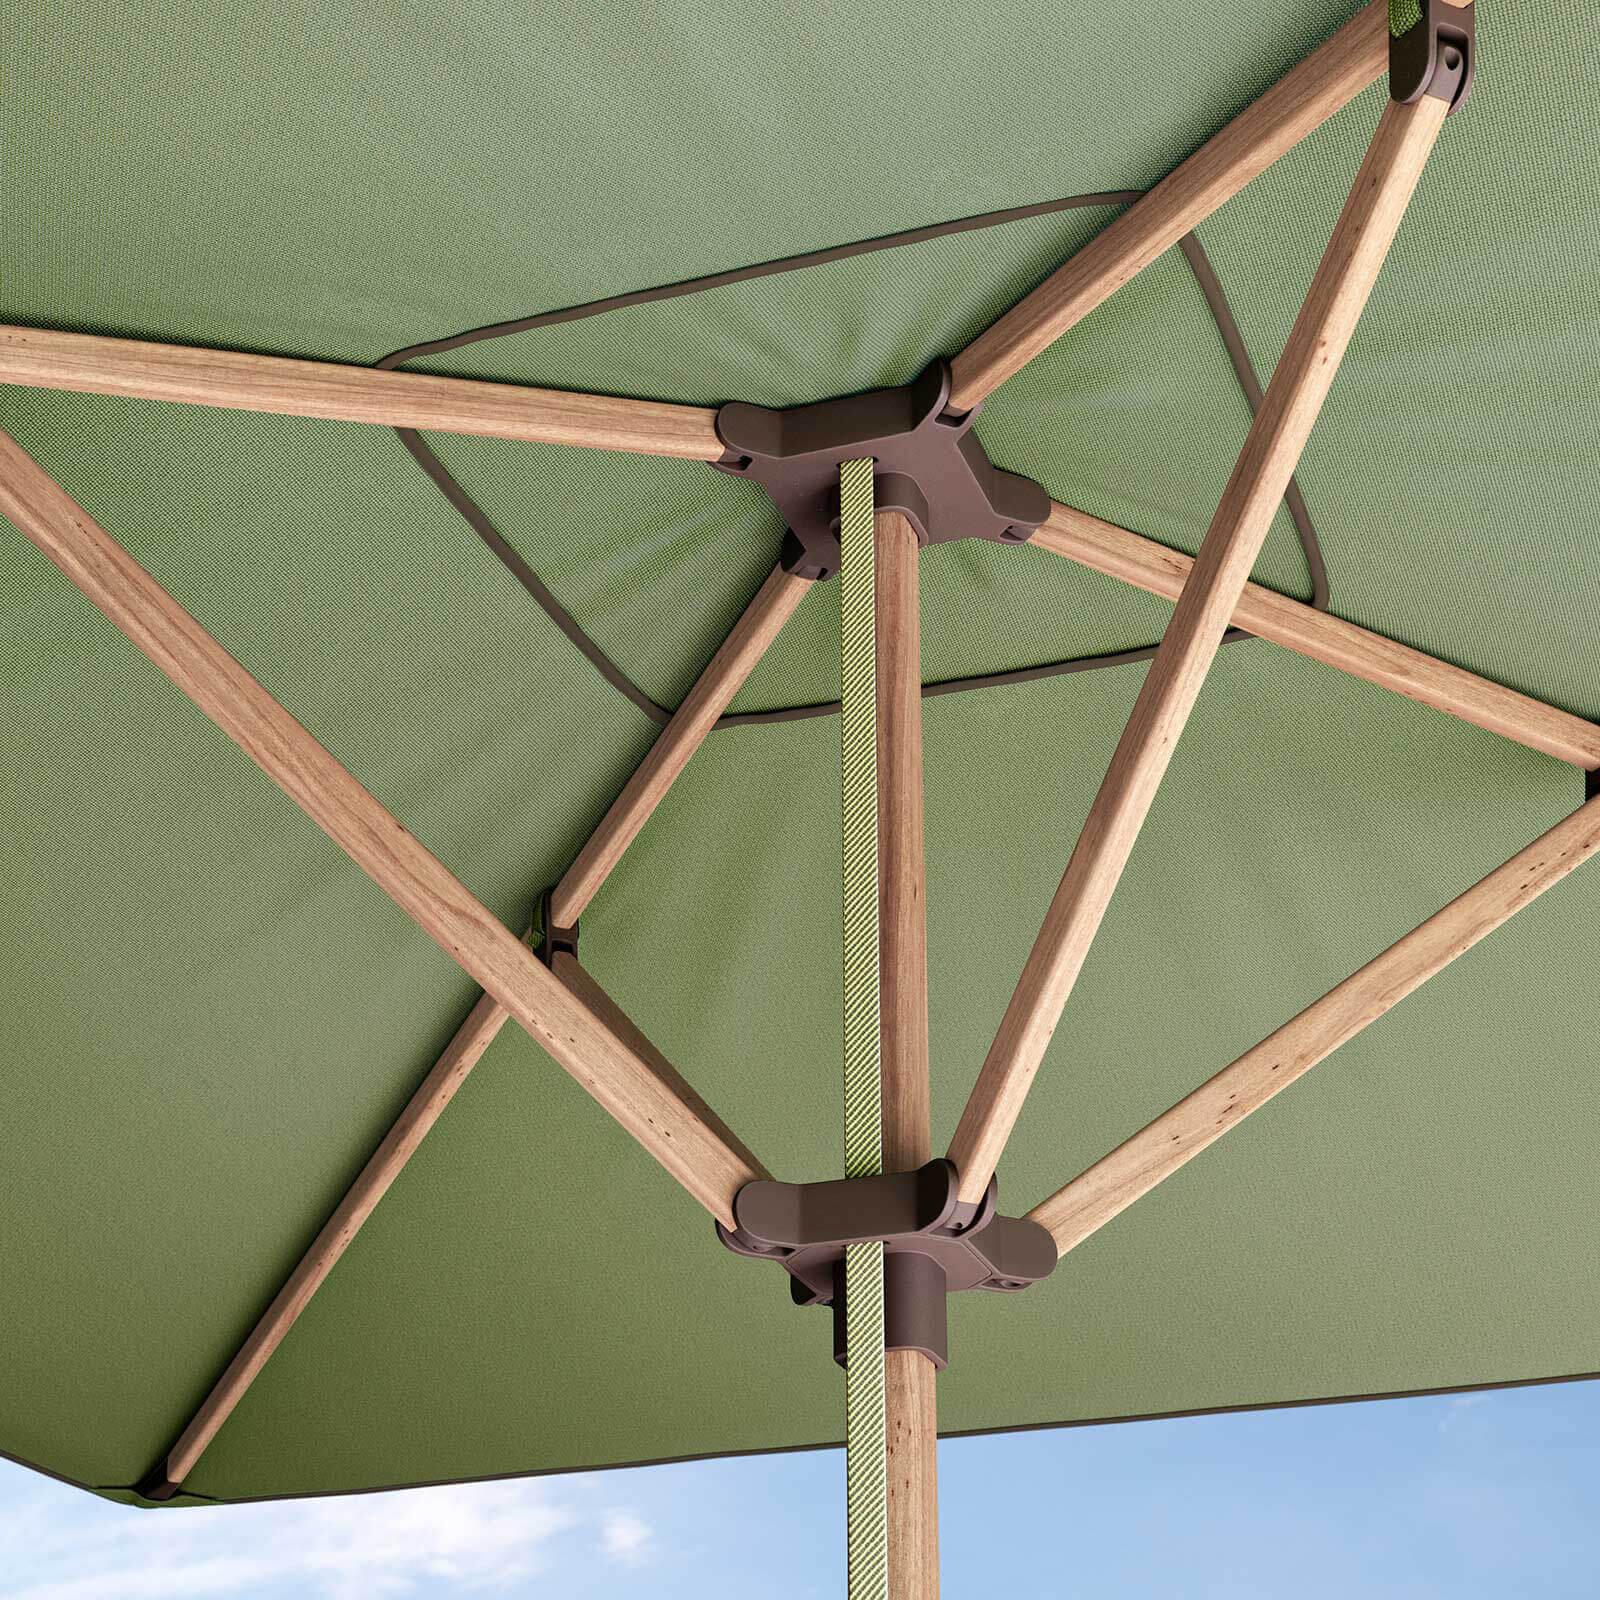 1627_0_meteo_parasol_aluwoodSQ.jpg